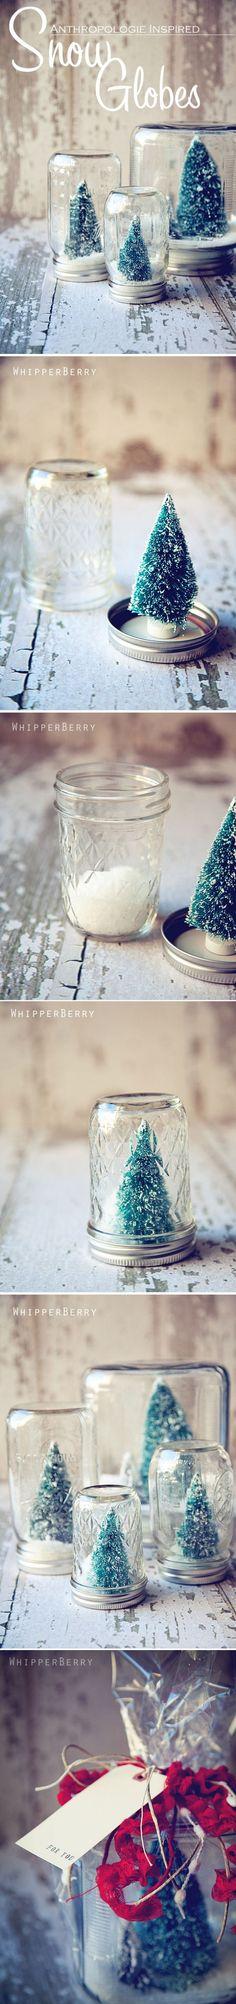 Reuse your Fluffpop Gourmet Cotton Candy Mini Mason Jar (www.Fluffpop.com)! Lieve mini kerstboompjes. Erg leuke cadeautjes.